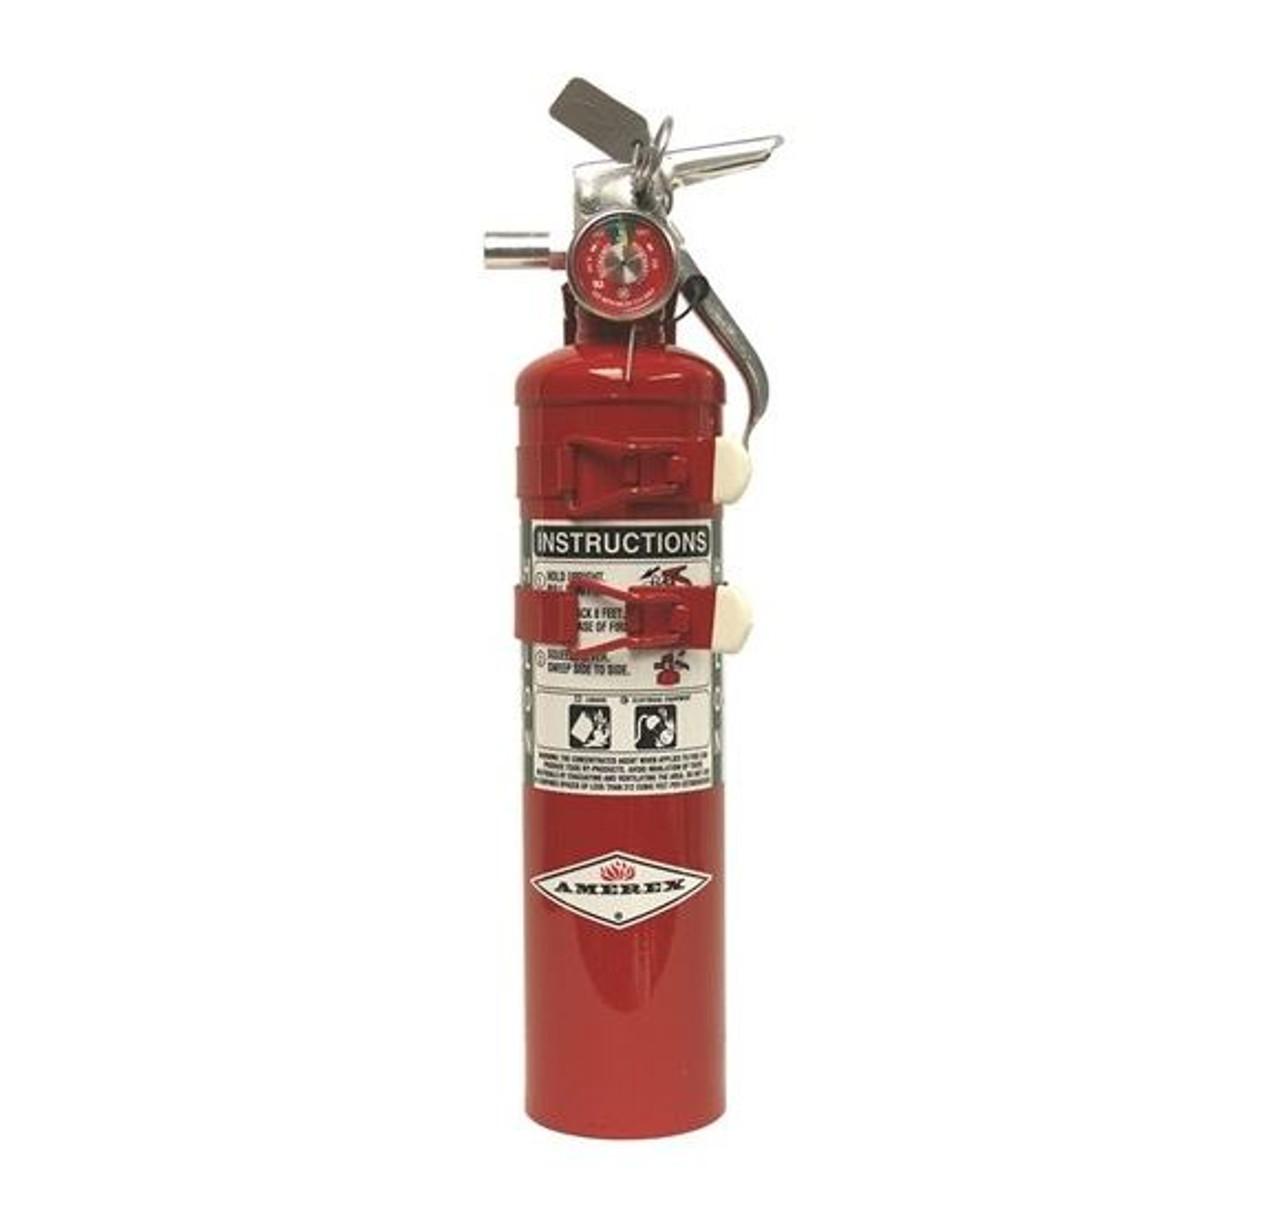 Amerex C352TS - 2.5 lb Halon 1211 Fire Extinguisher